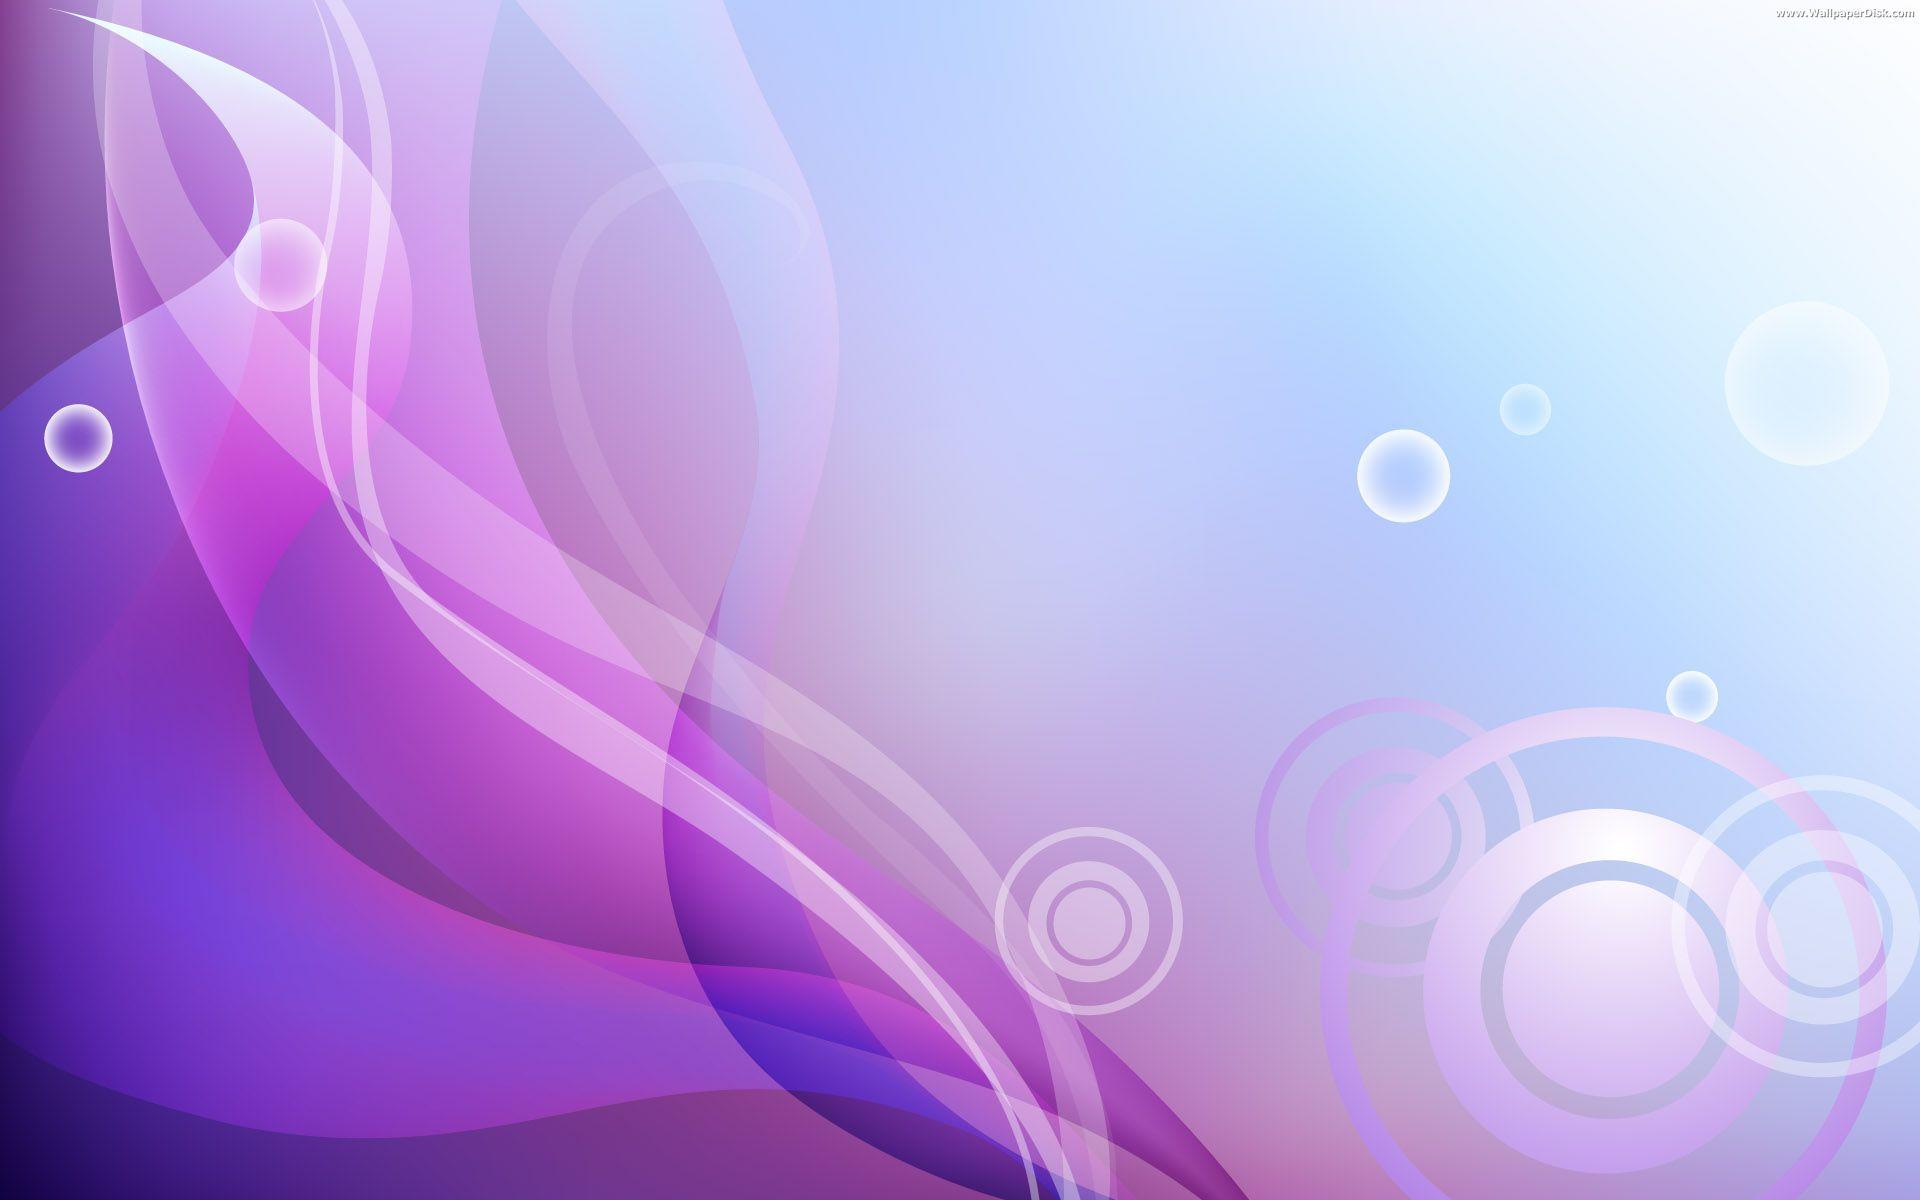 Free Desktop Wallpaper Background